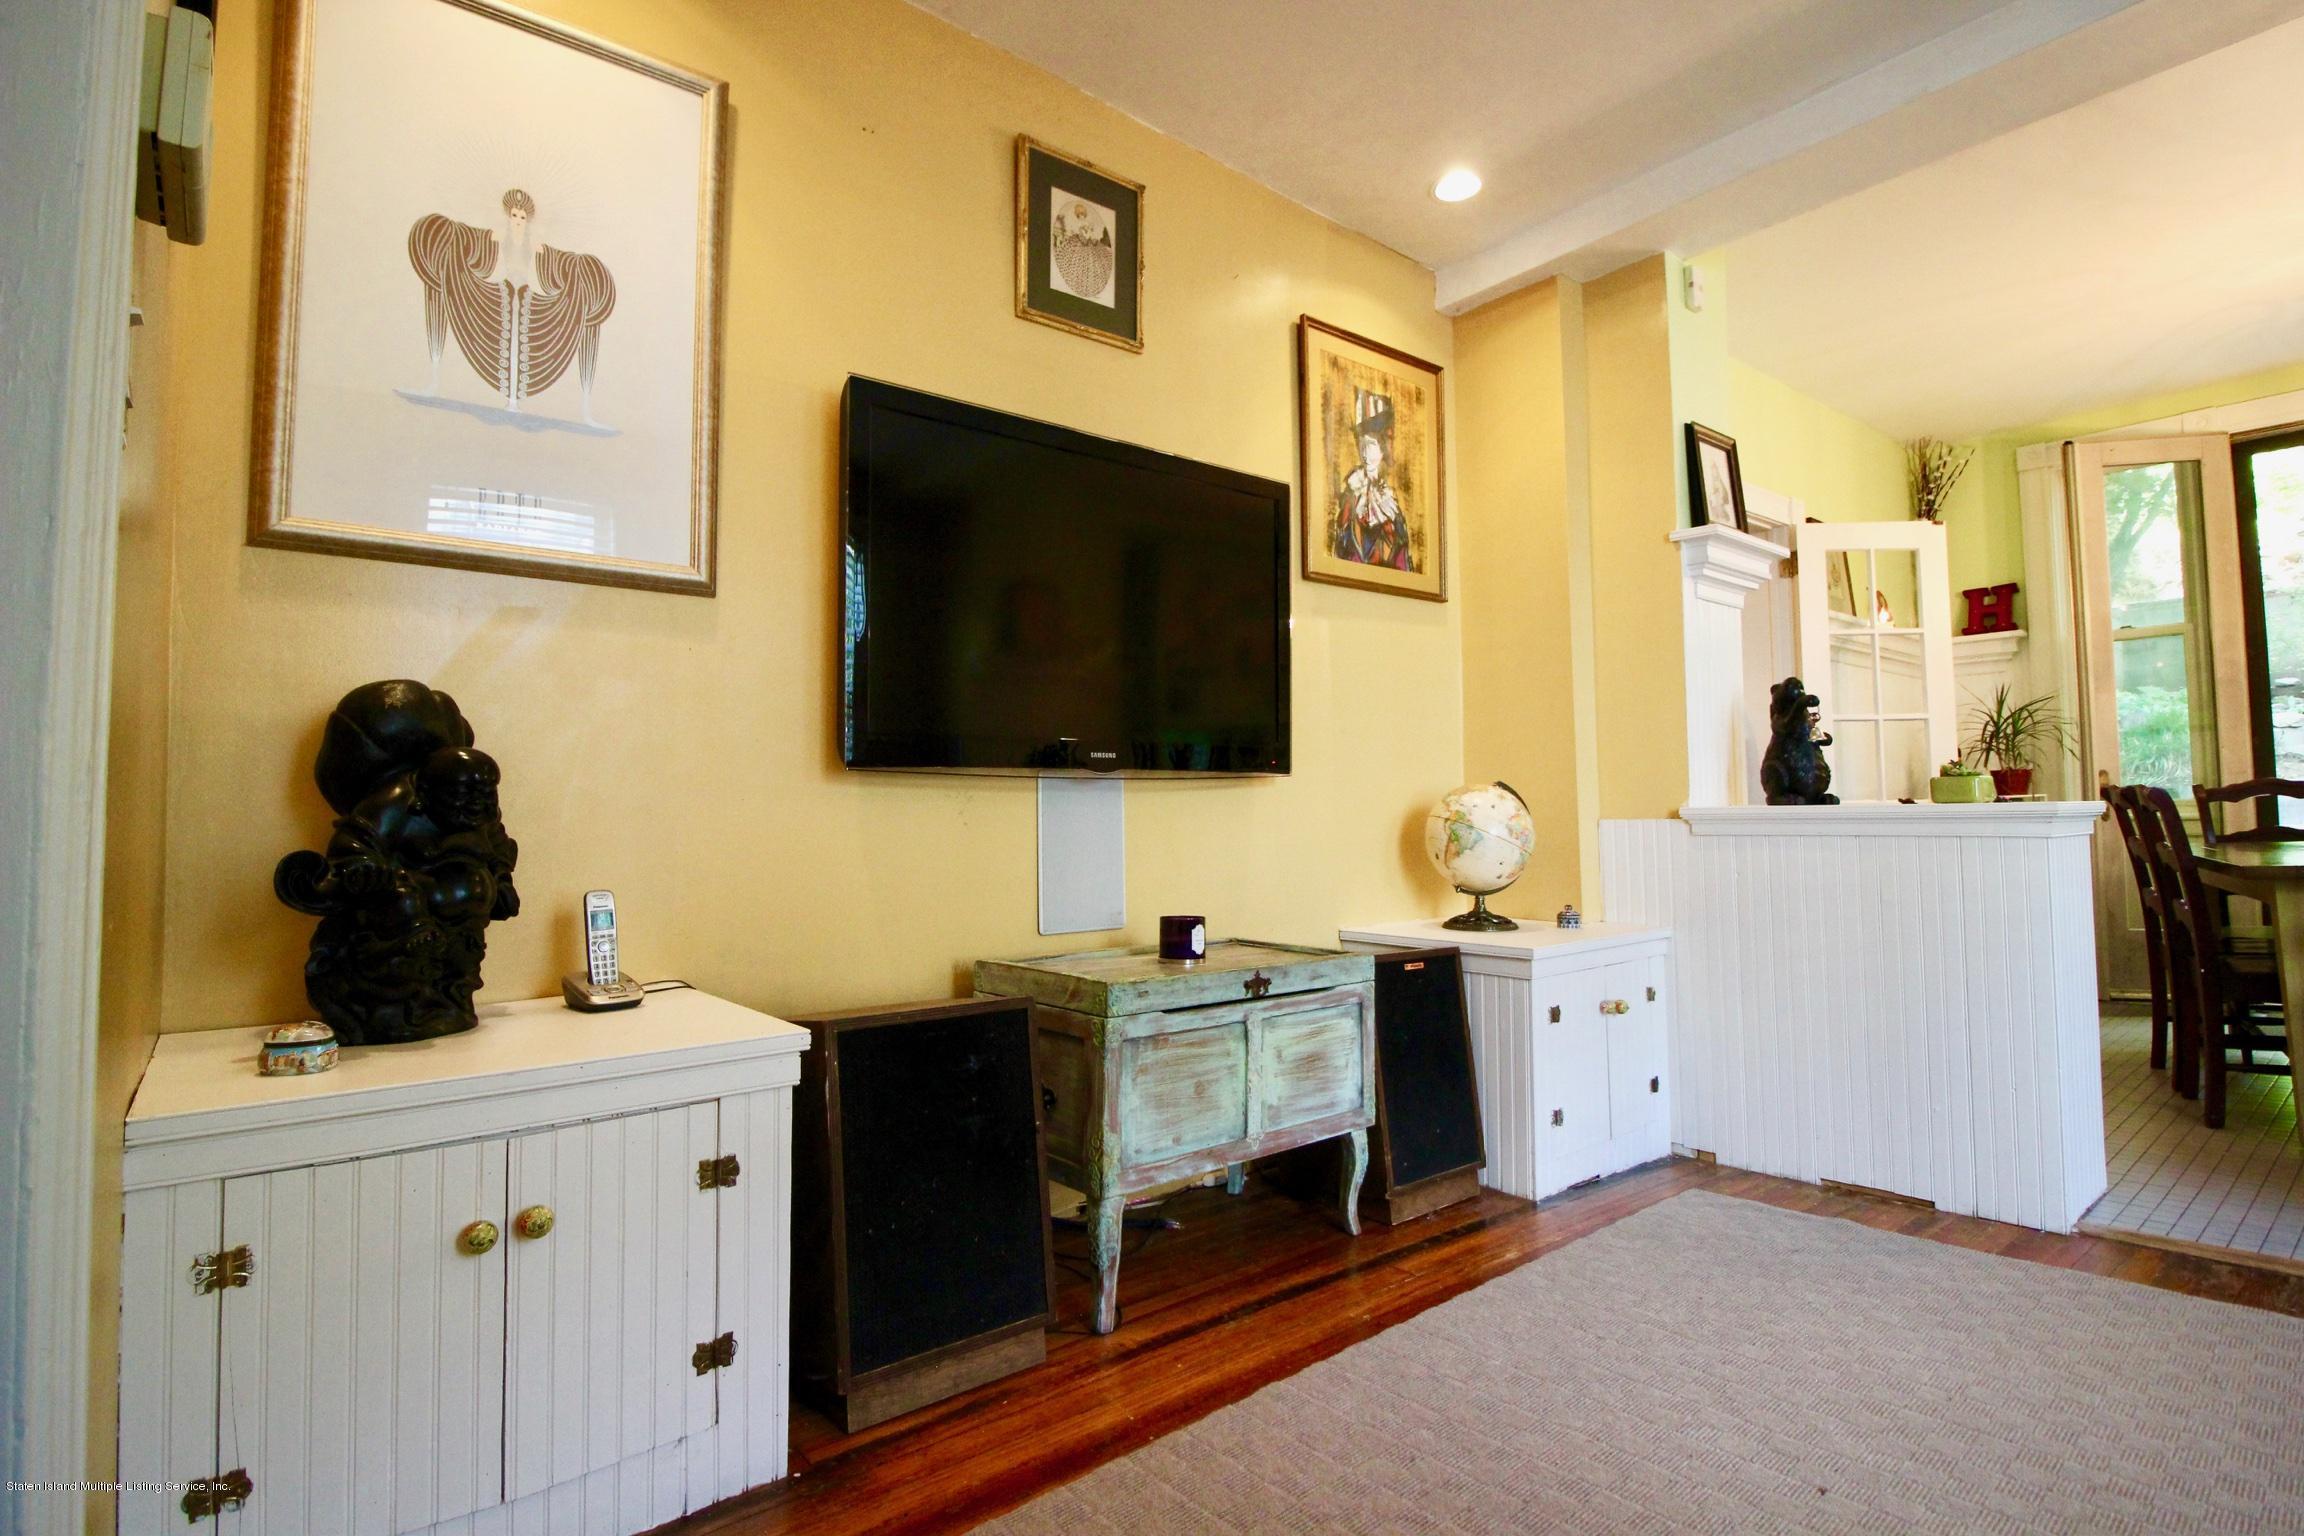 Single Family - Detached 208 St Pauls Avenue  Staten Island, NY 10304, MLS-1129566-15